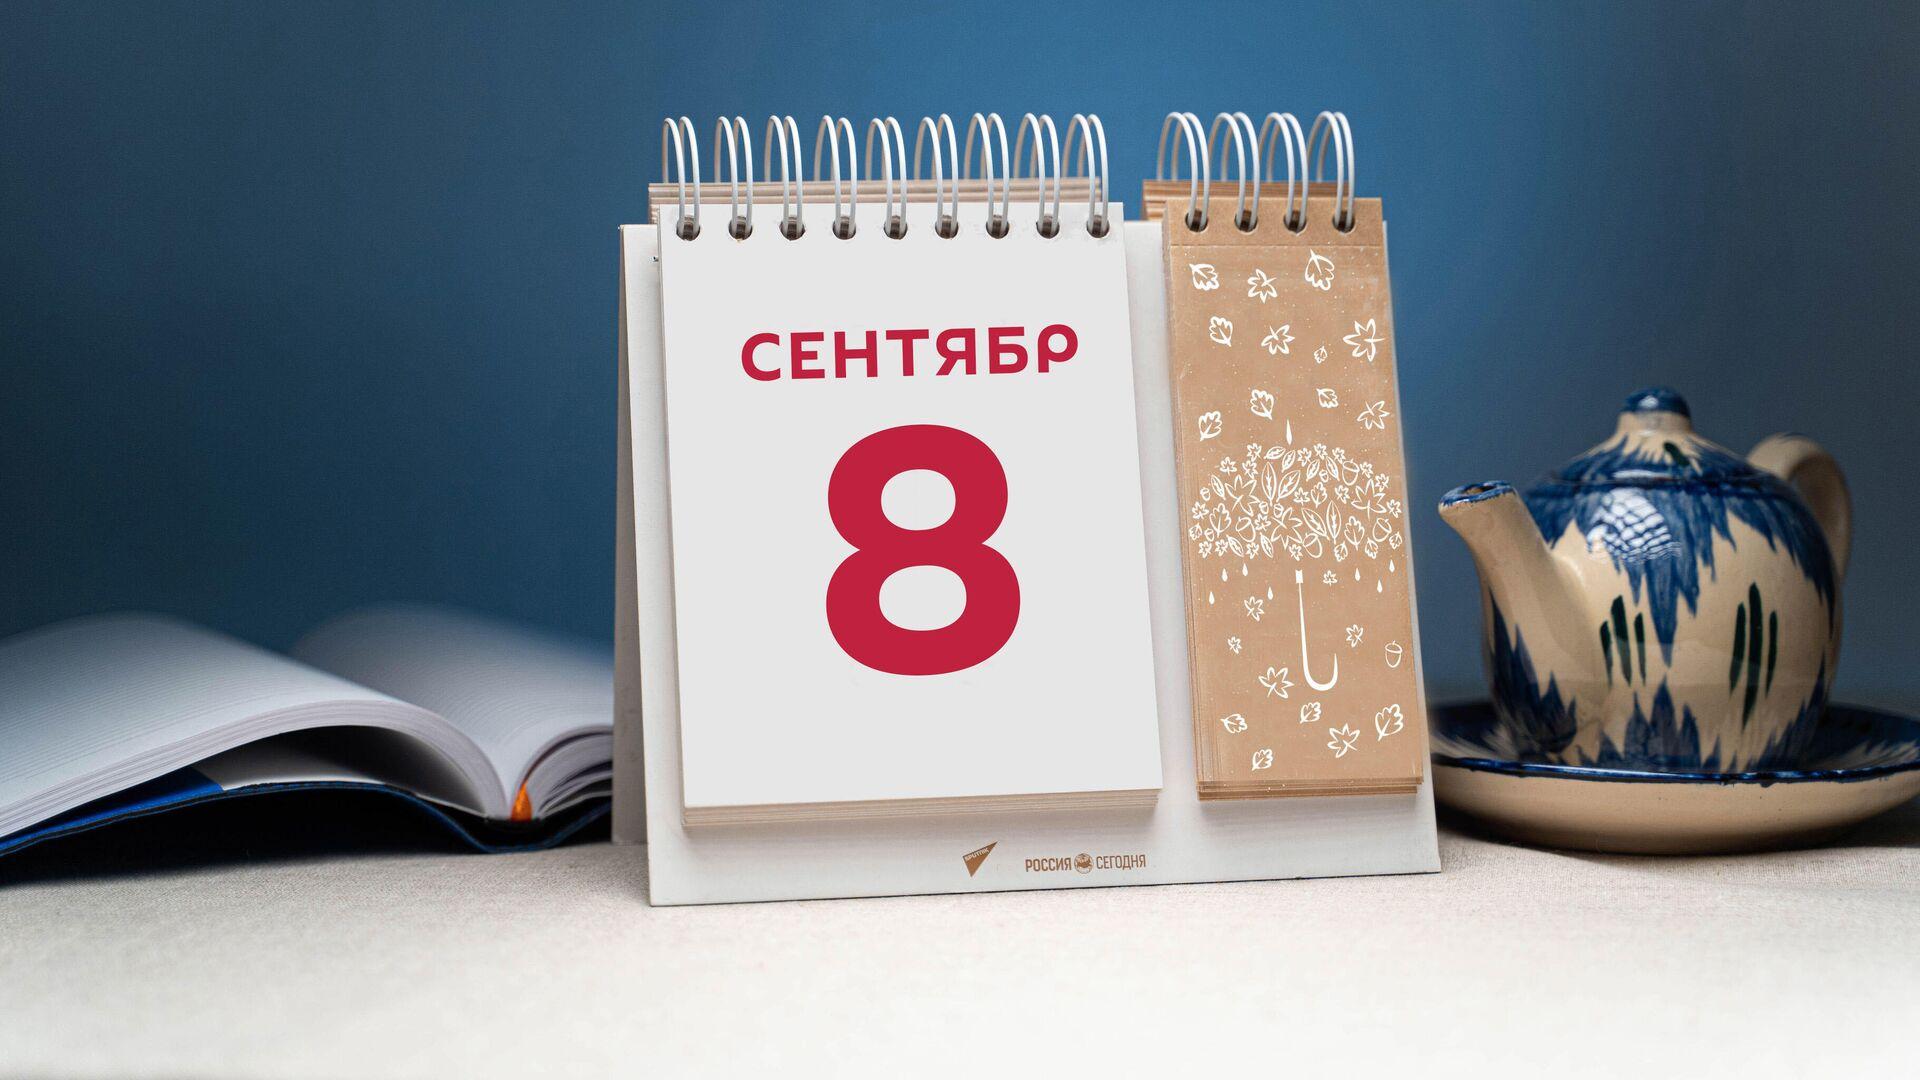 День 8 сентября - Sputnik Тоҷикистон, 1920, 08.09.2021